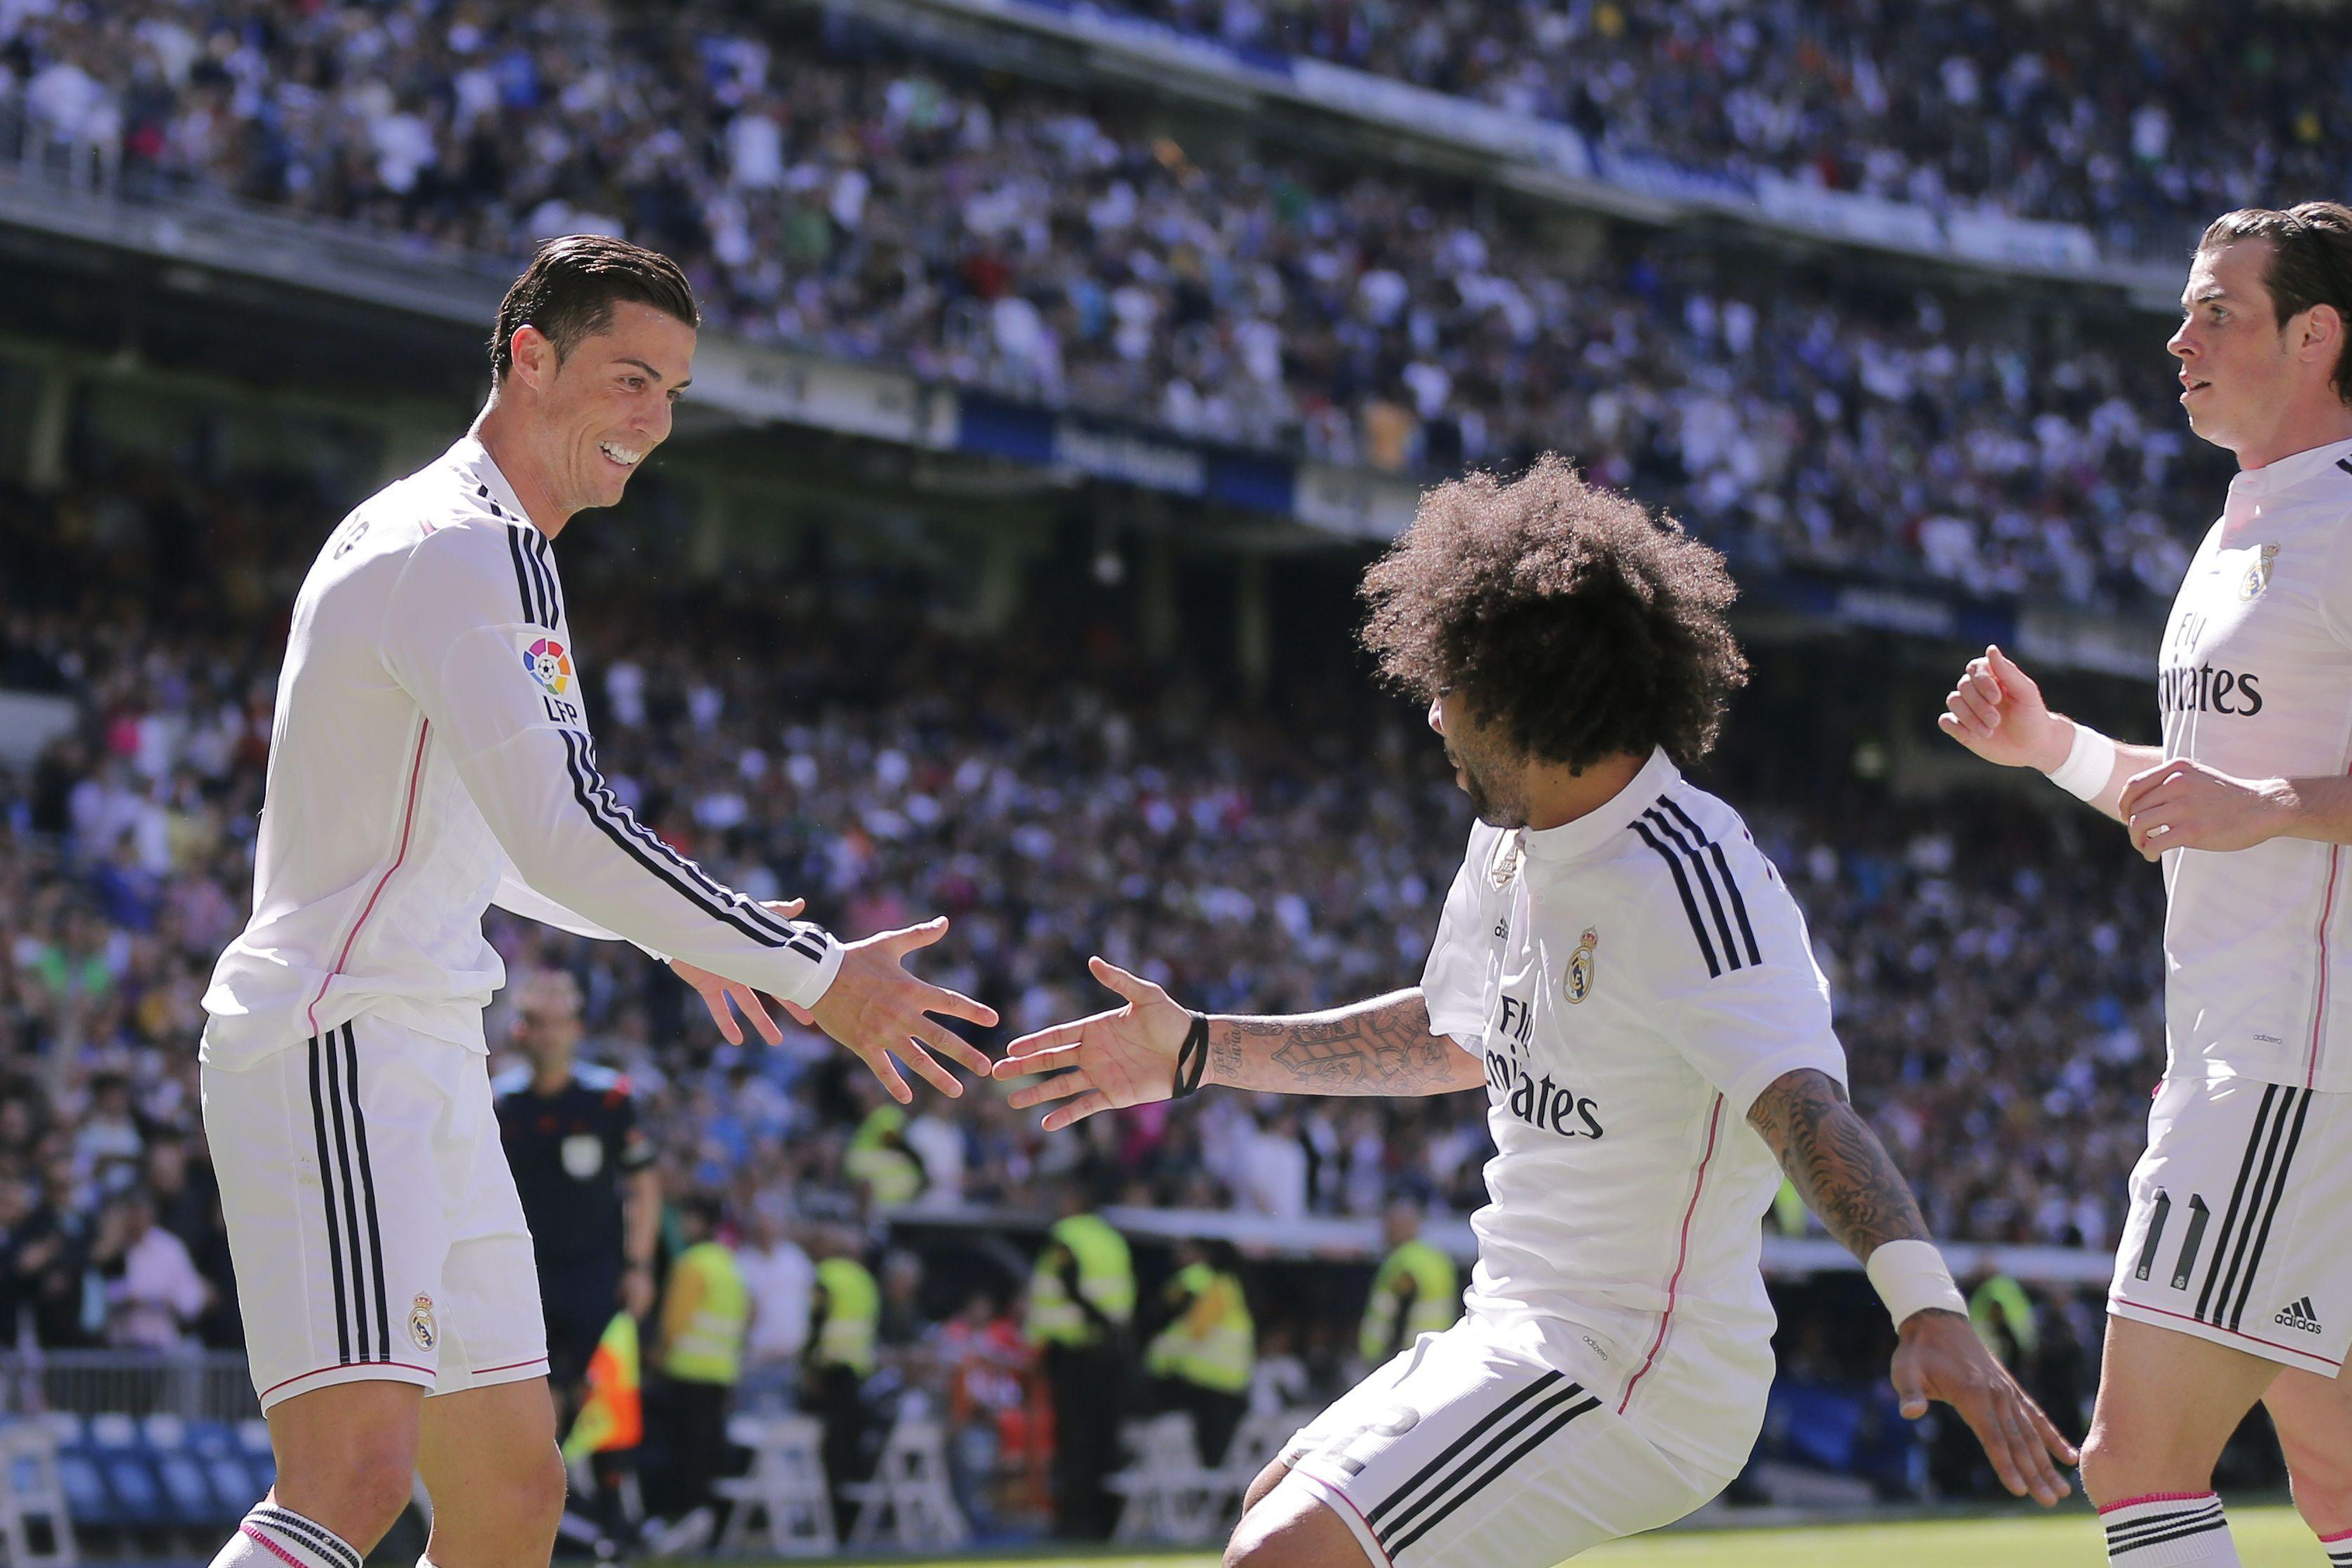 Thefootballmind Ronaldo, Cristiano ronaldo, Real madrid